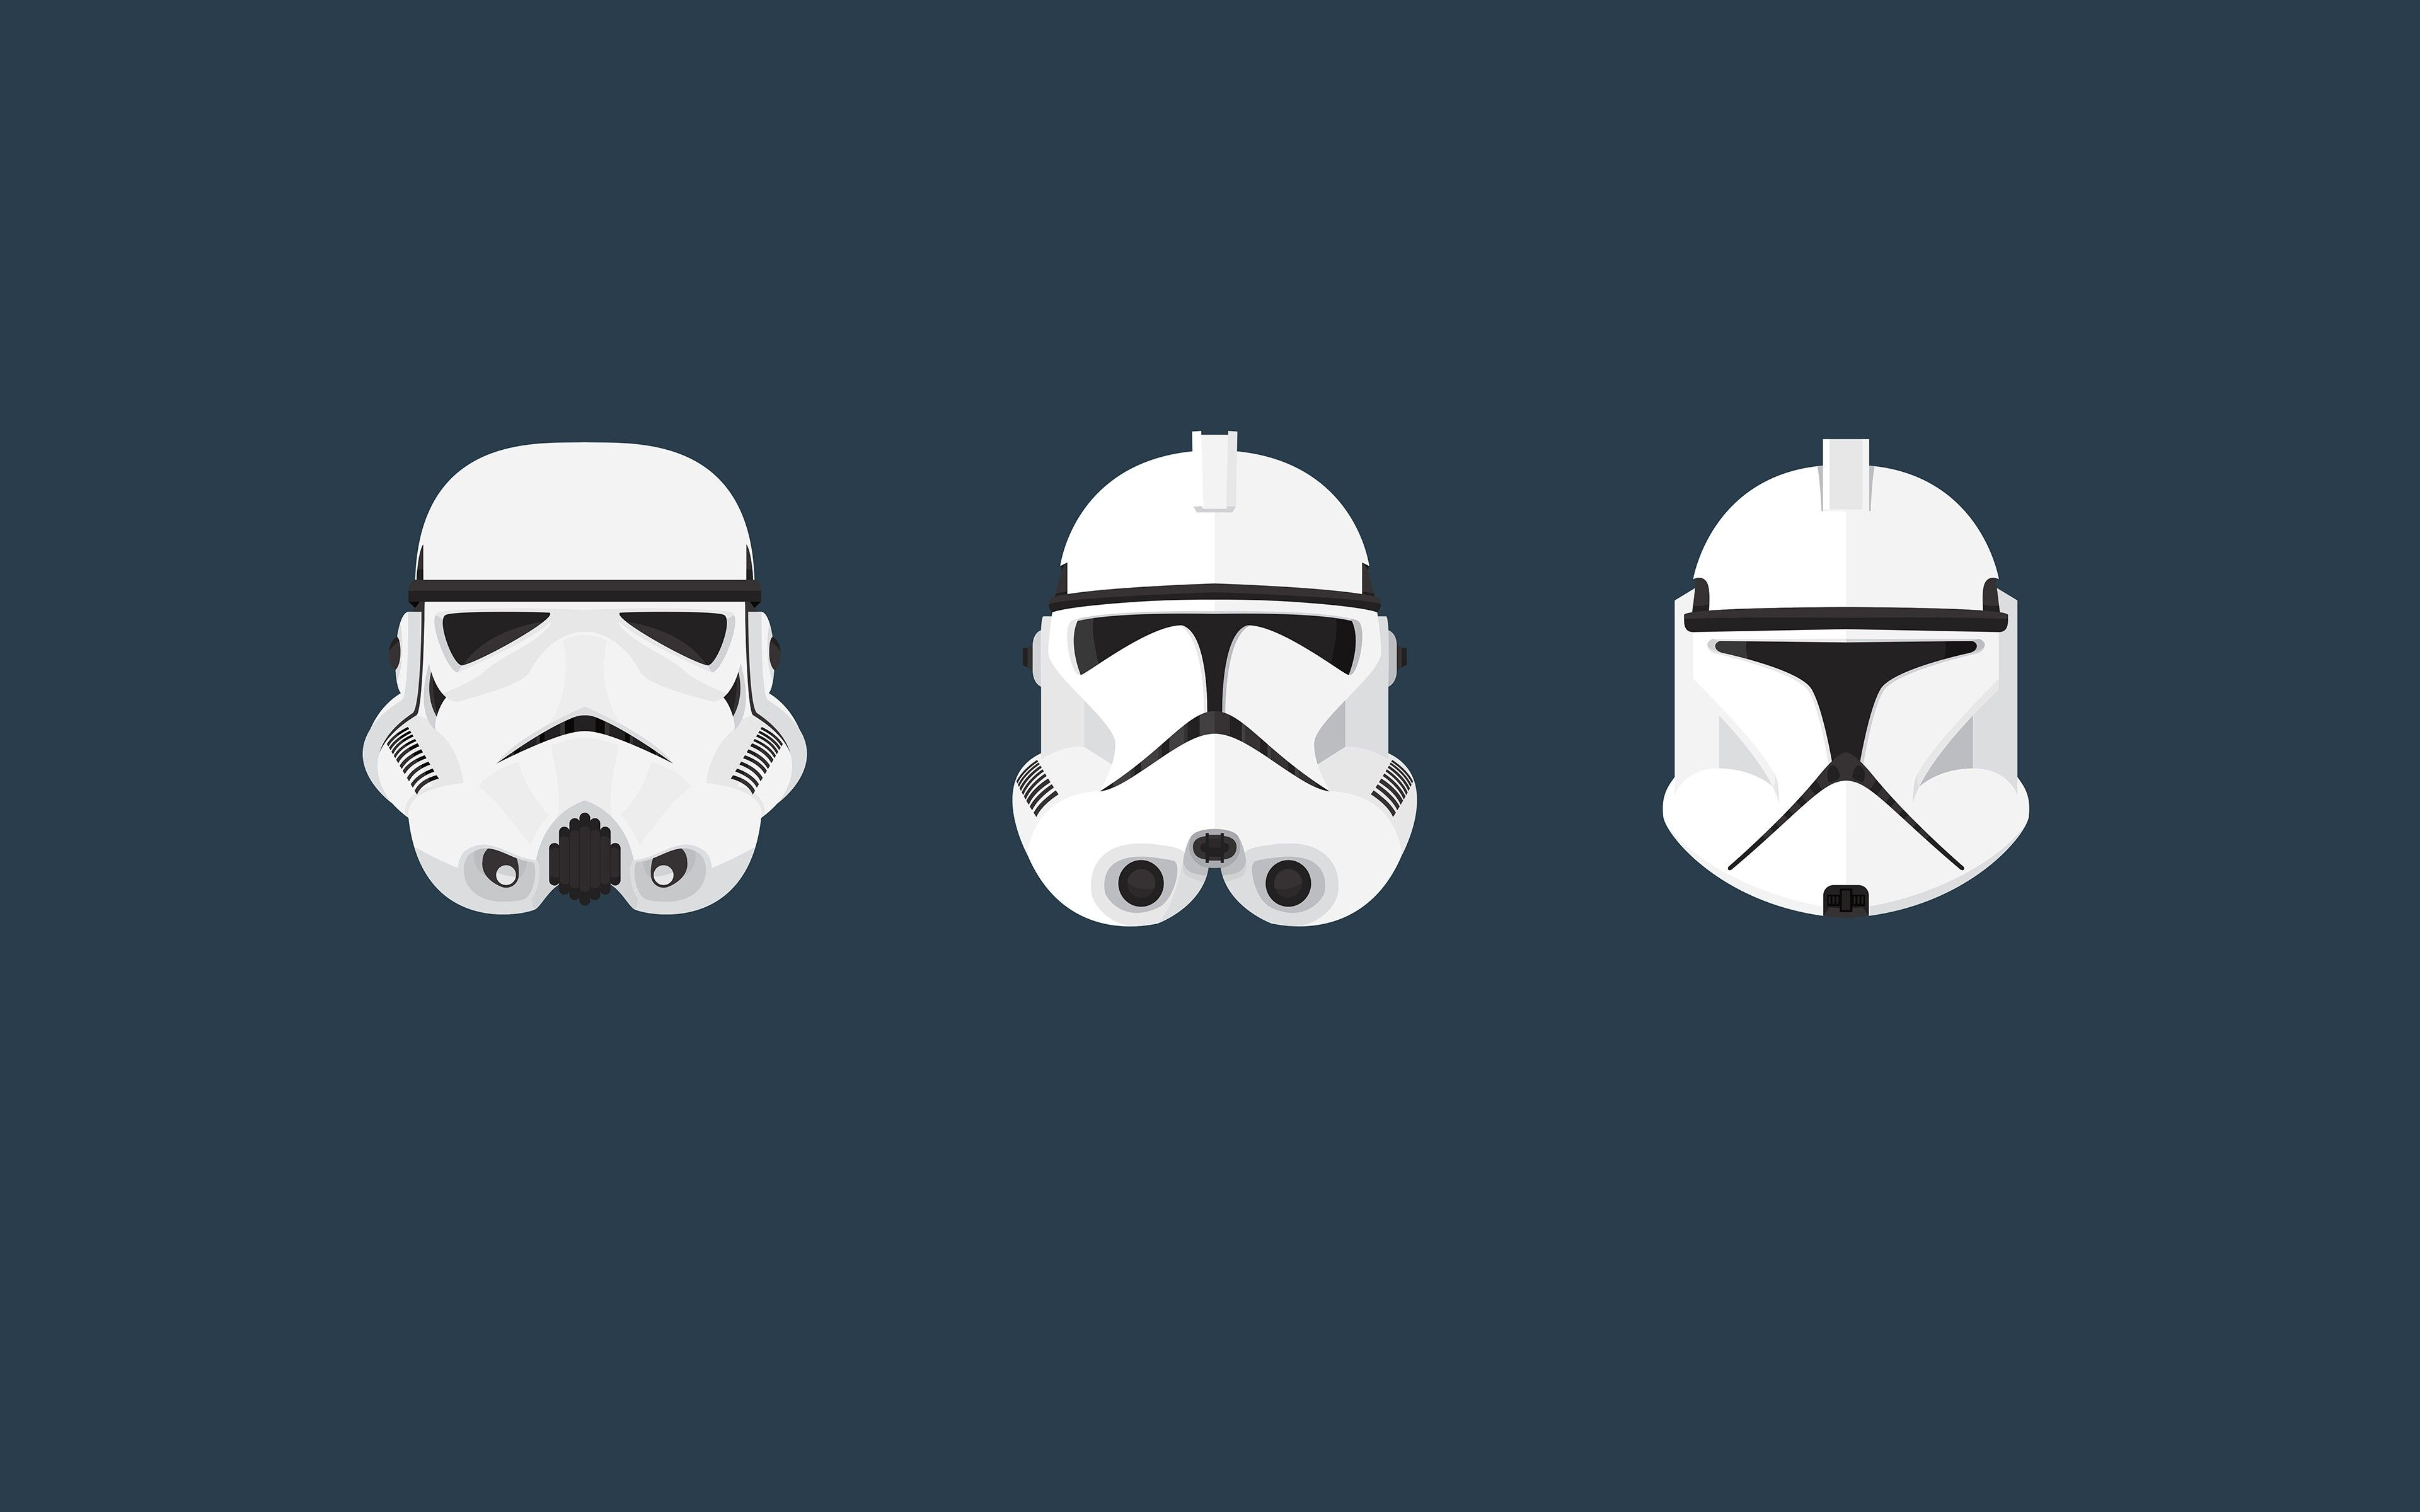 Star Wars Clone Trooper Stormtrooper Helmet Minimalism Wallpaper Download Wallpaper Hd Clone Trooper Hd Wallpaper